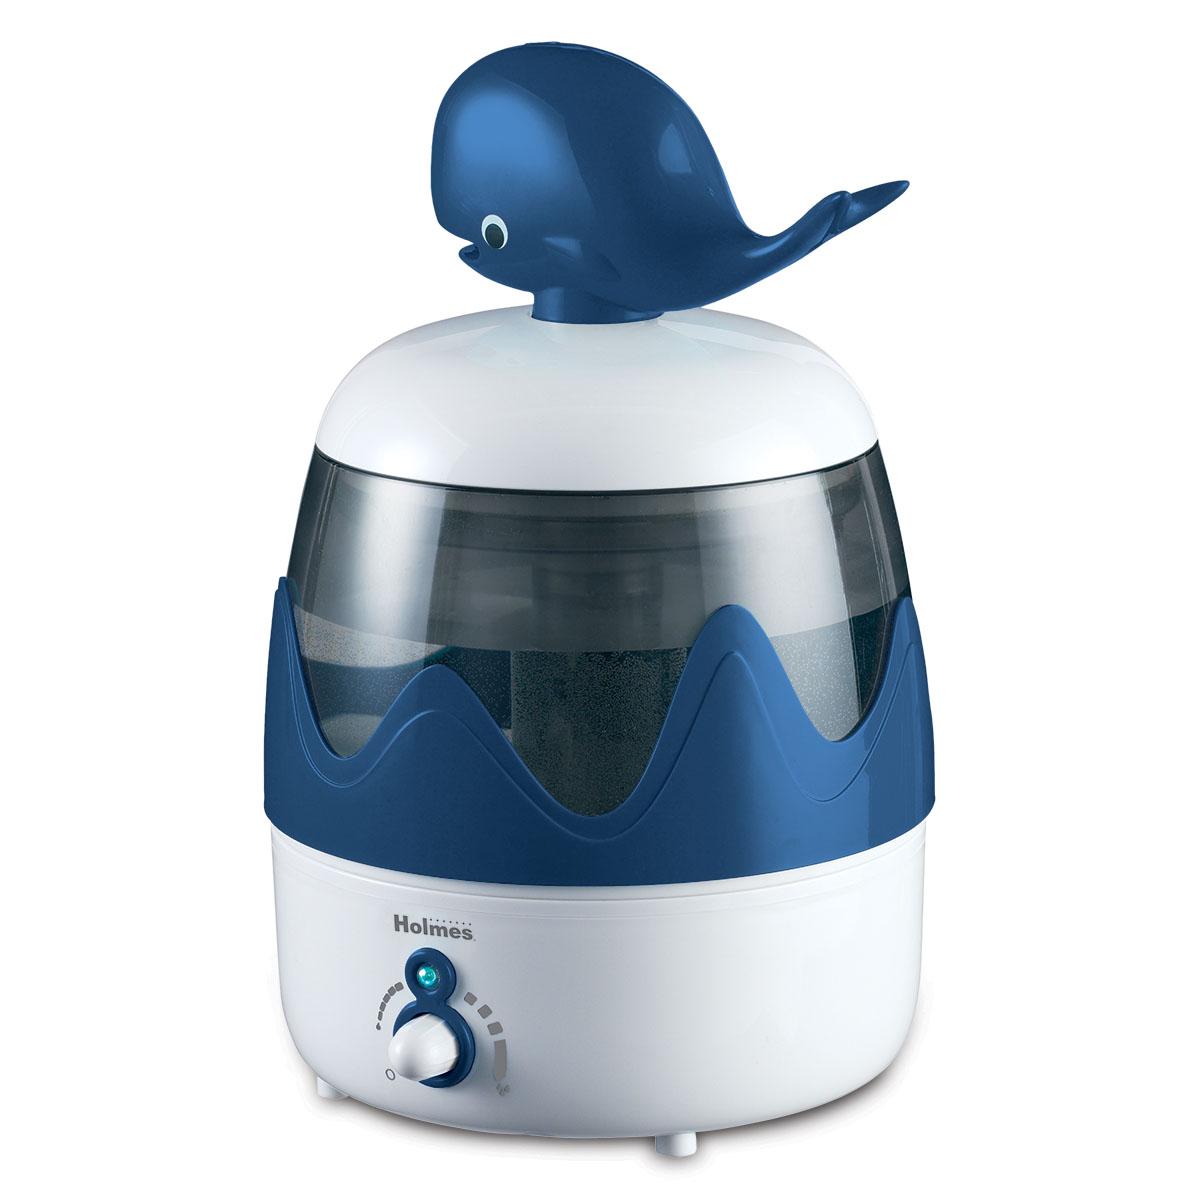 Holmes Ultrasonic Humidifier, Whale HUL2622W-UM 0